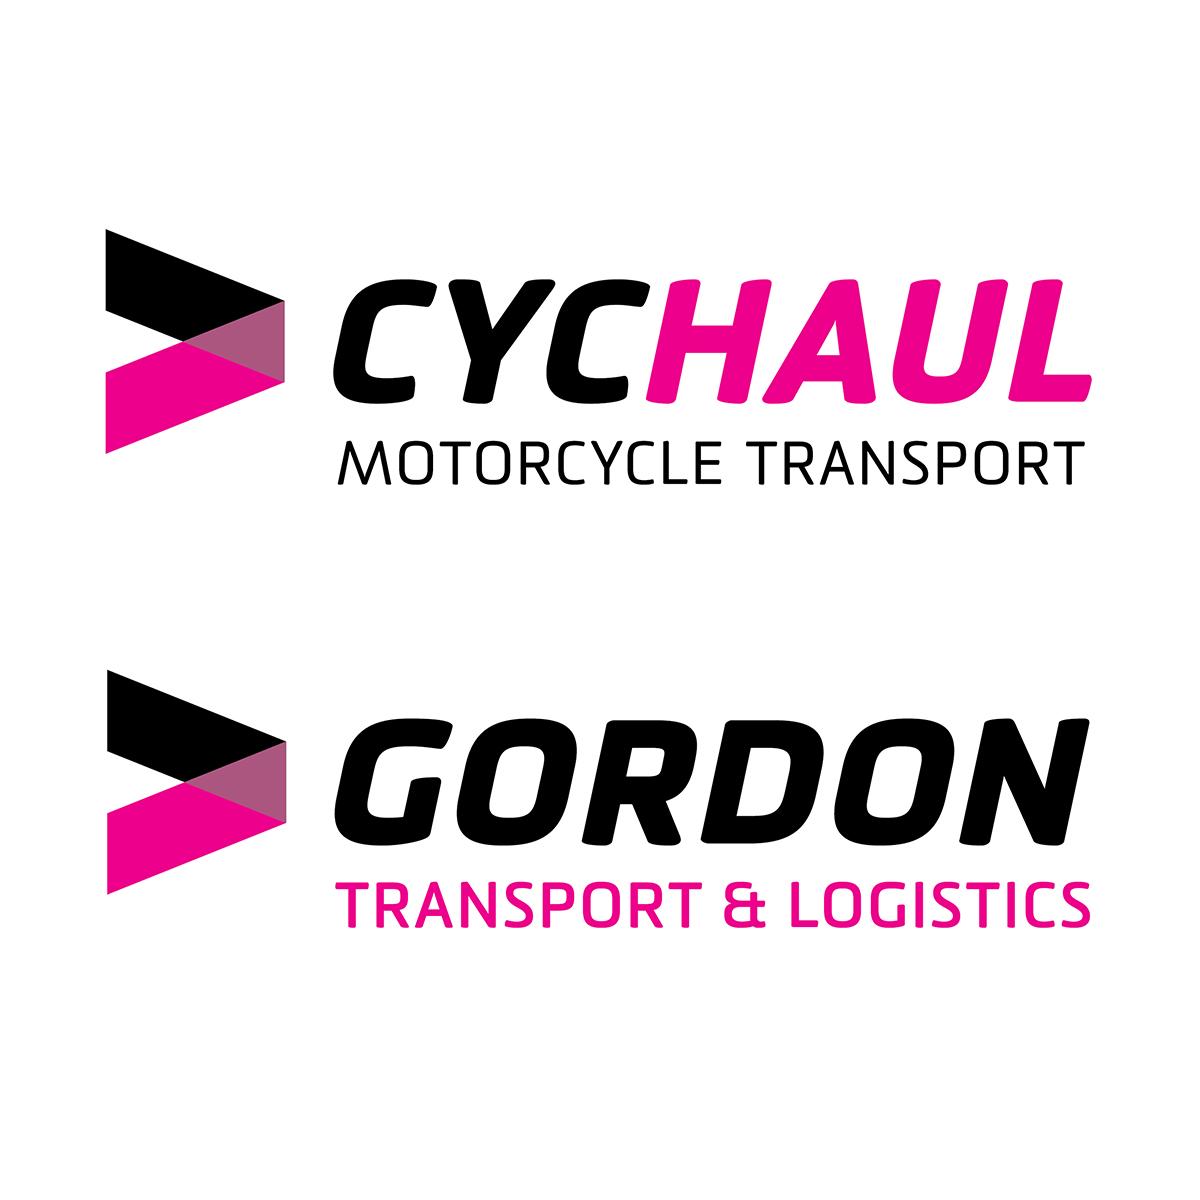 cychaul-gtl-branding-logo-design-white.jpg